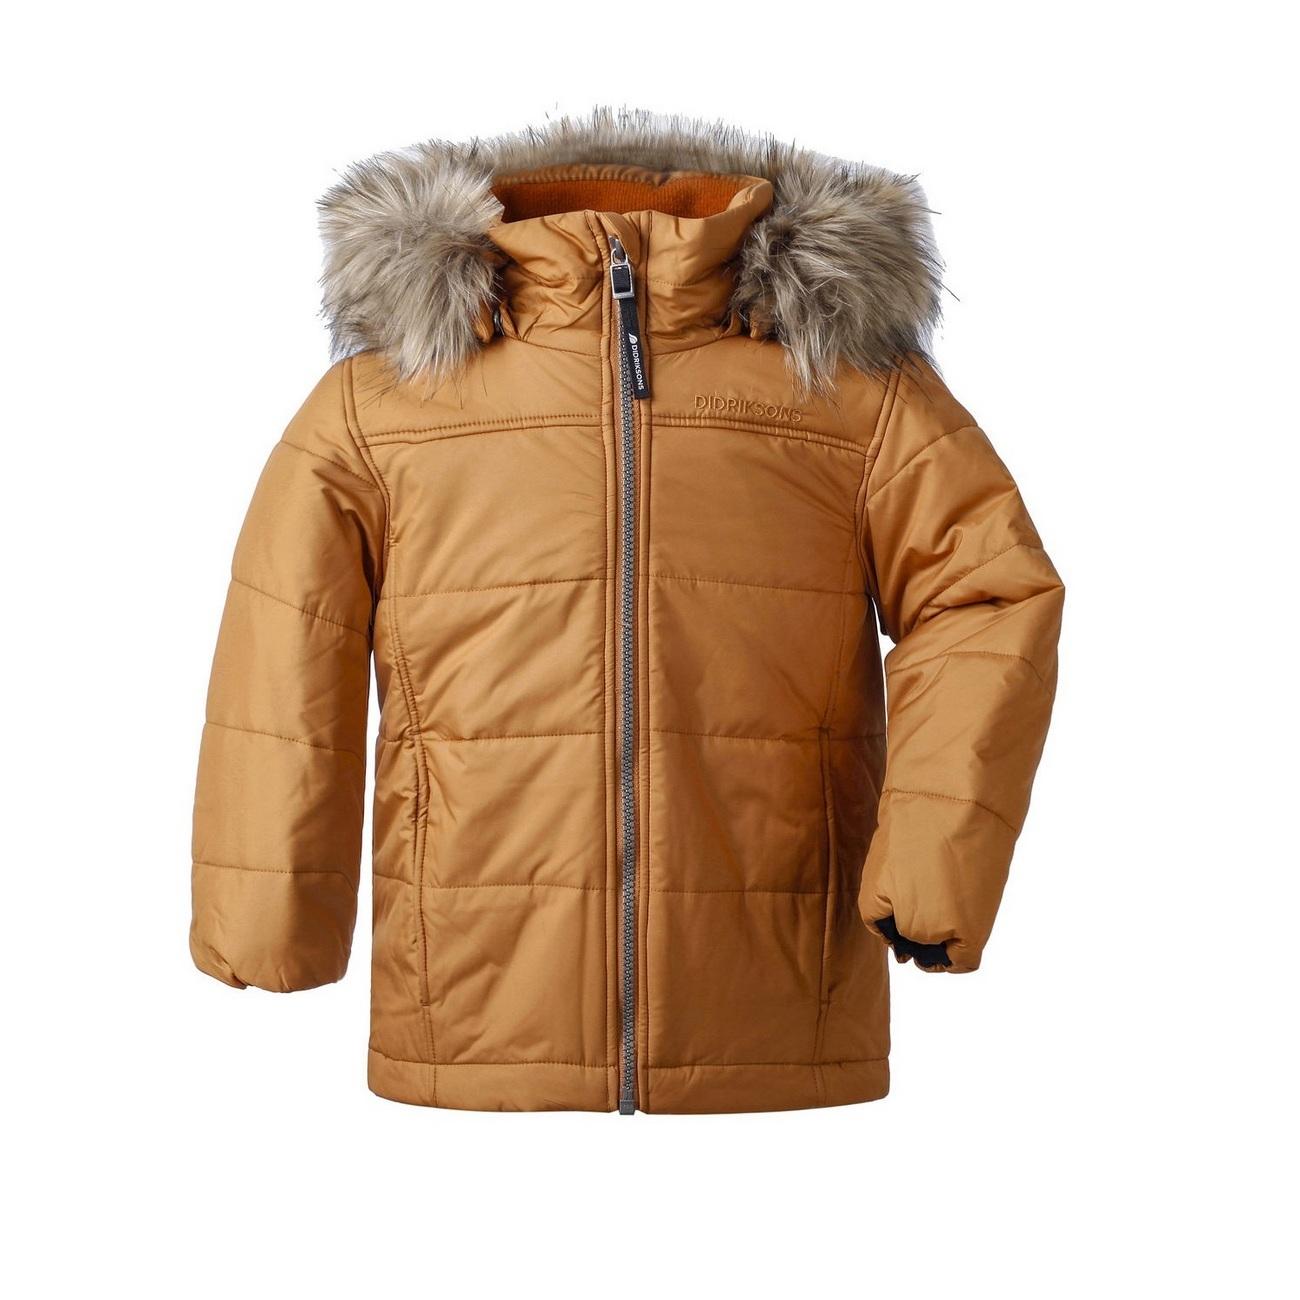 куртка Didriksons Malmgren Leather brown (охра)